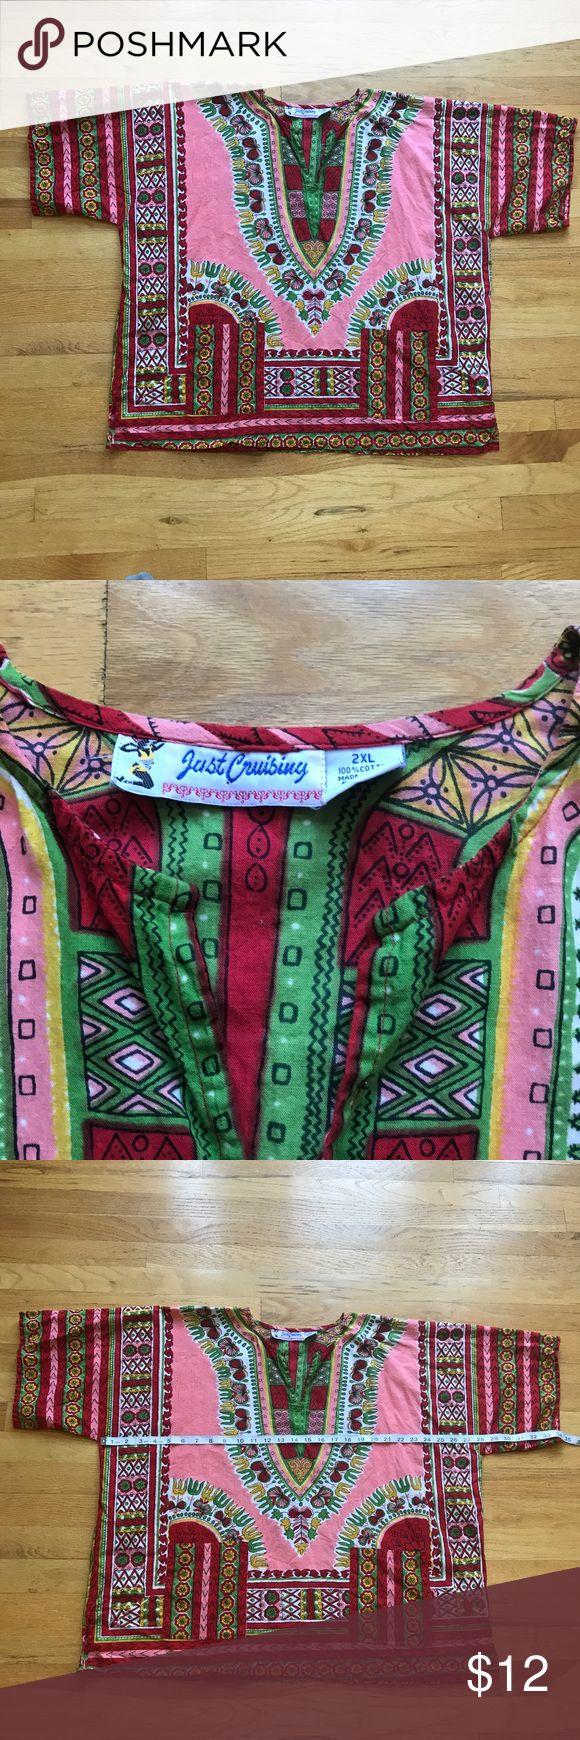 Dashiki Shirt Dashiki Shirt. Just Cruising is the brand. Size 2XL. 100% cotton. 2 Pockets on front. Just Cruising Shirts